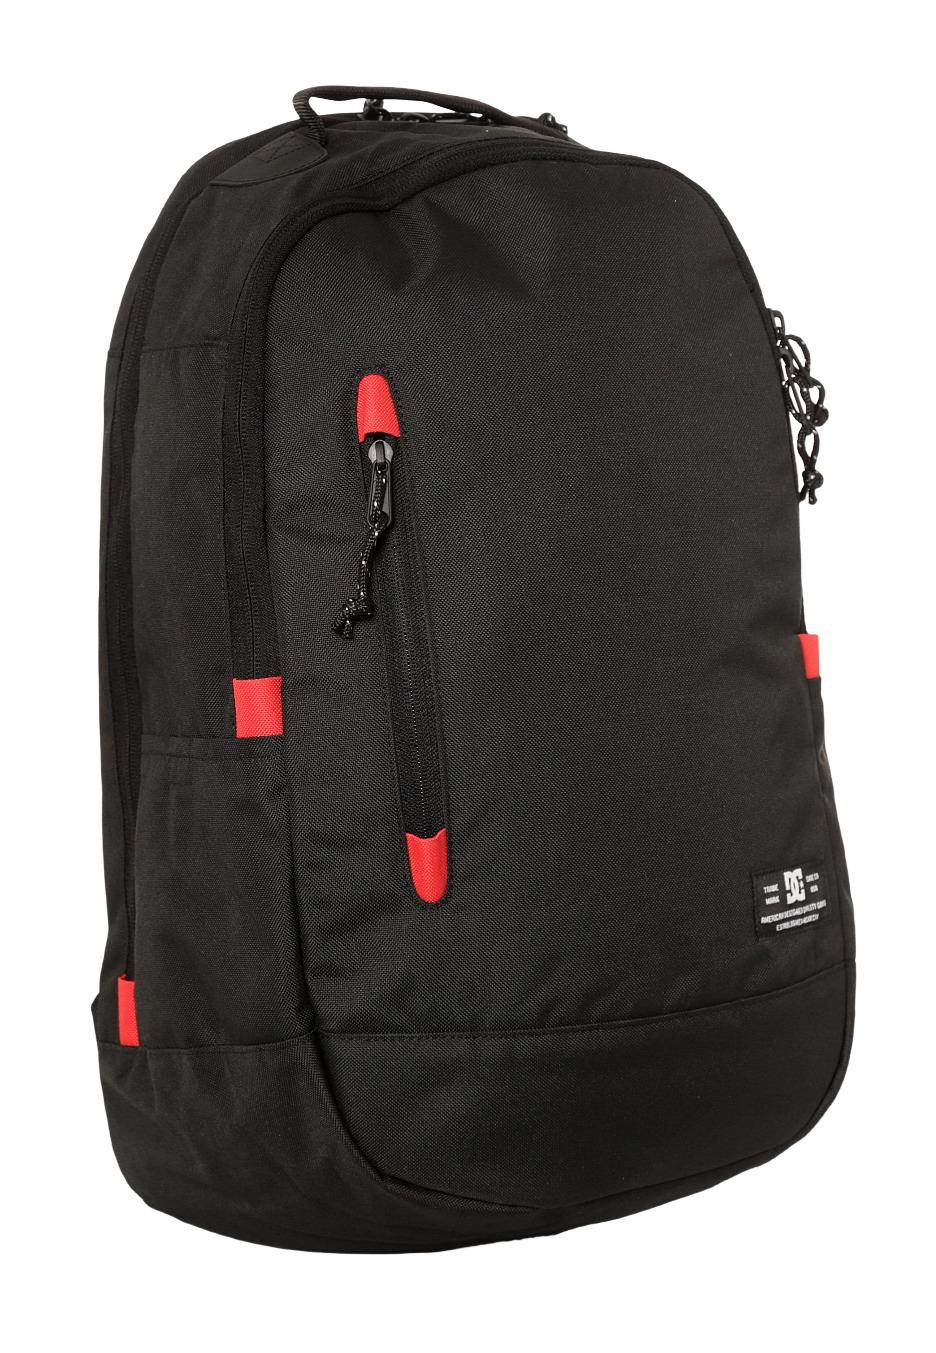 6d4b5b8615 DC - Trekker - Batoh - Streetwear obchod - Impericon.com CZ SK